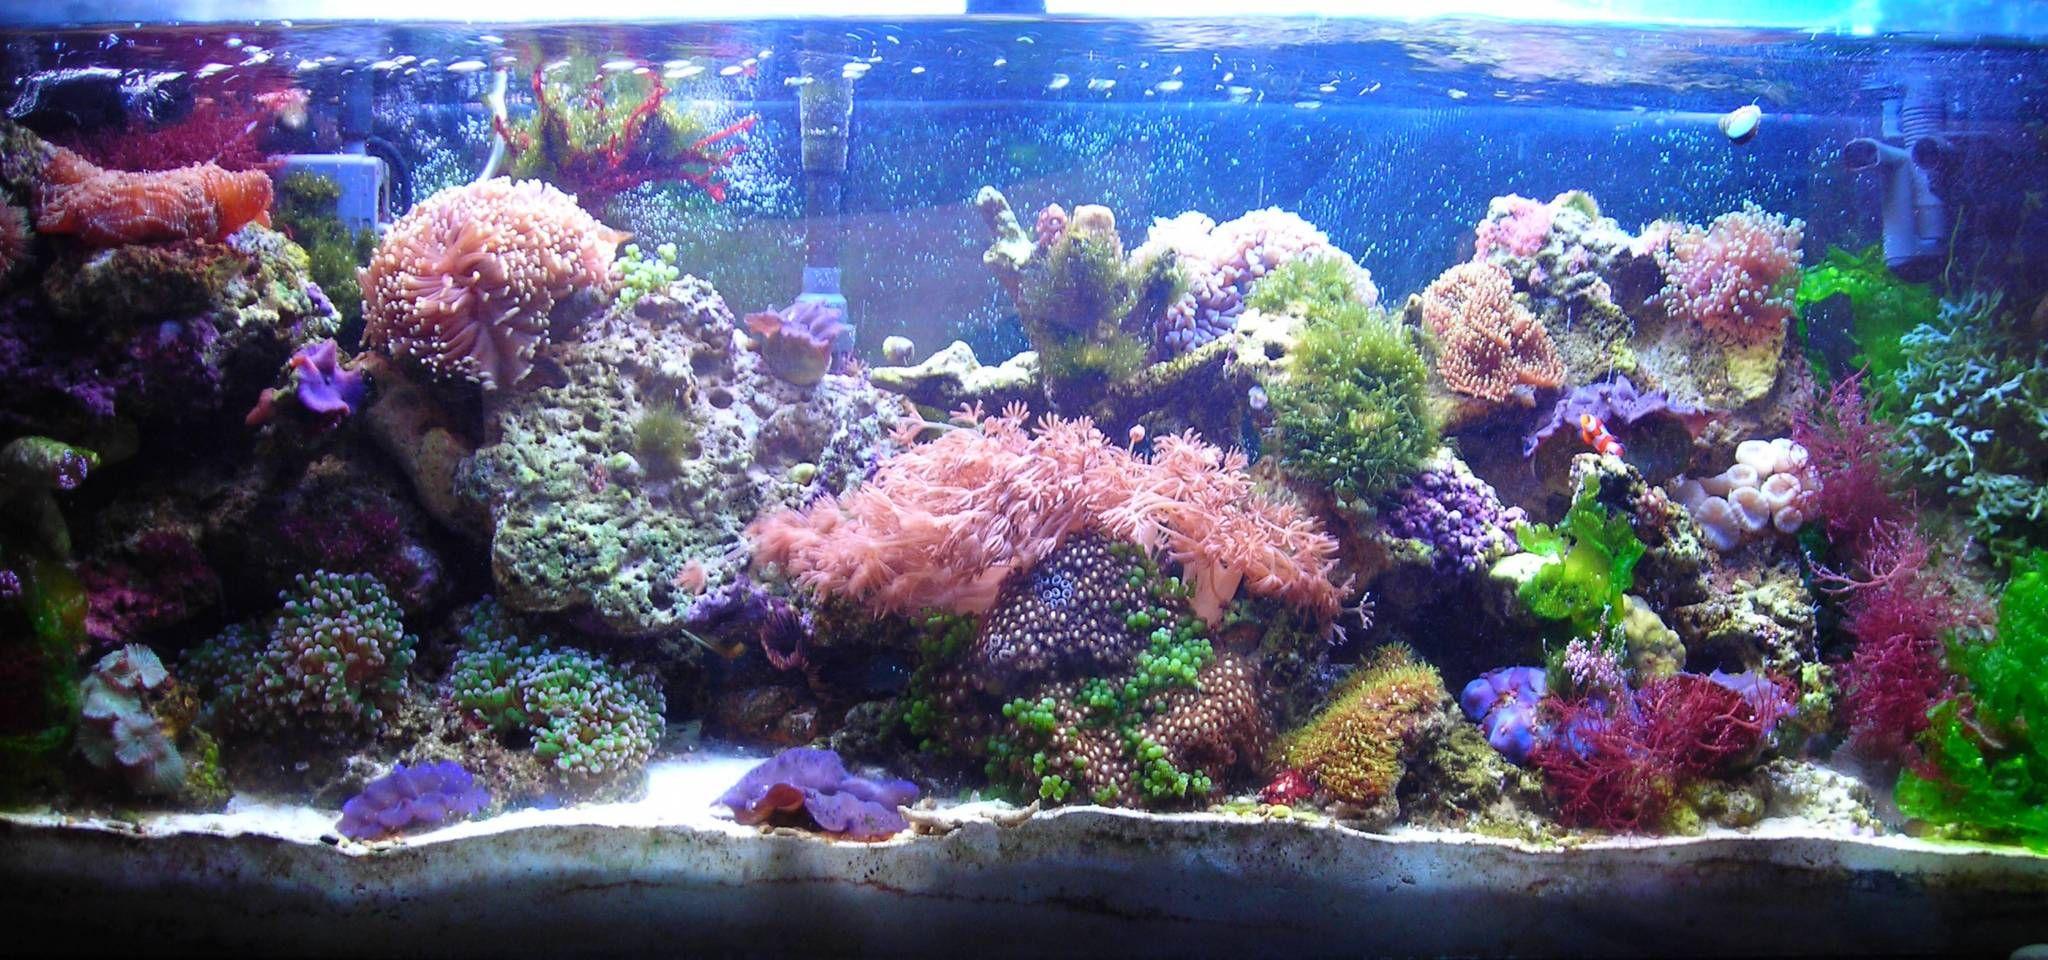 Pin by jennifer steuerwald on aquariums and fish pinterest